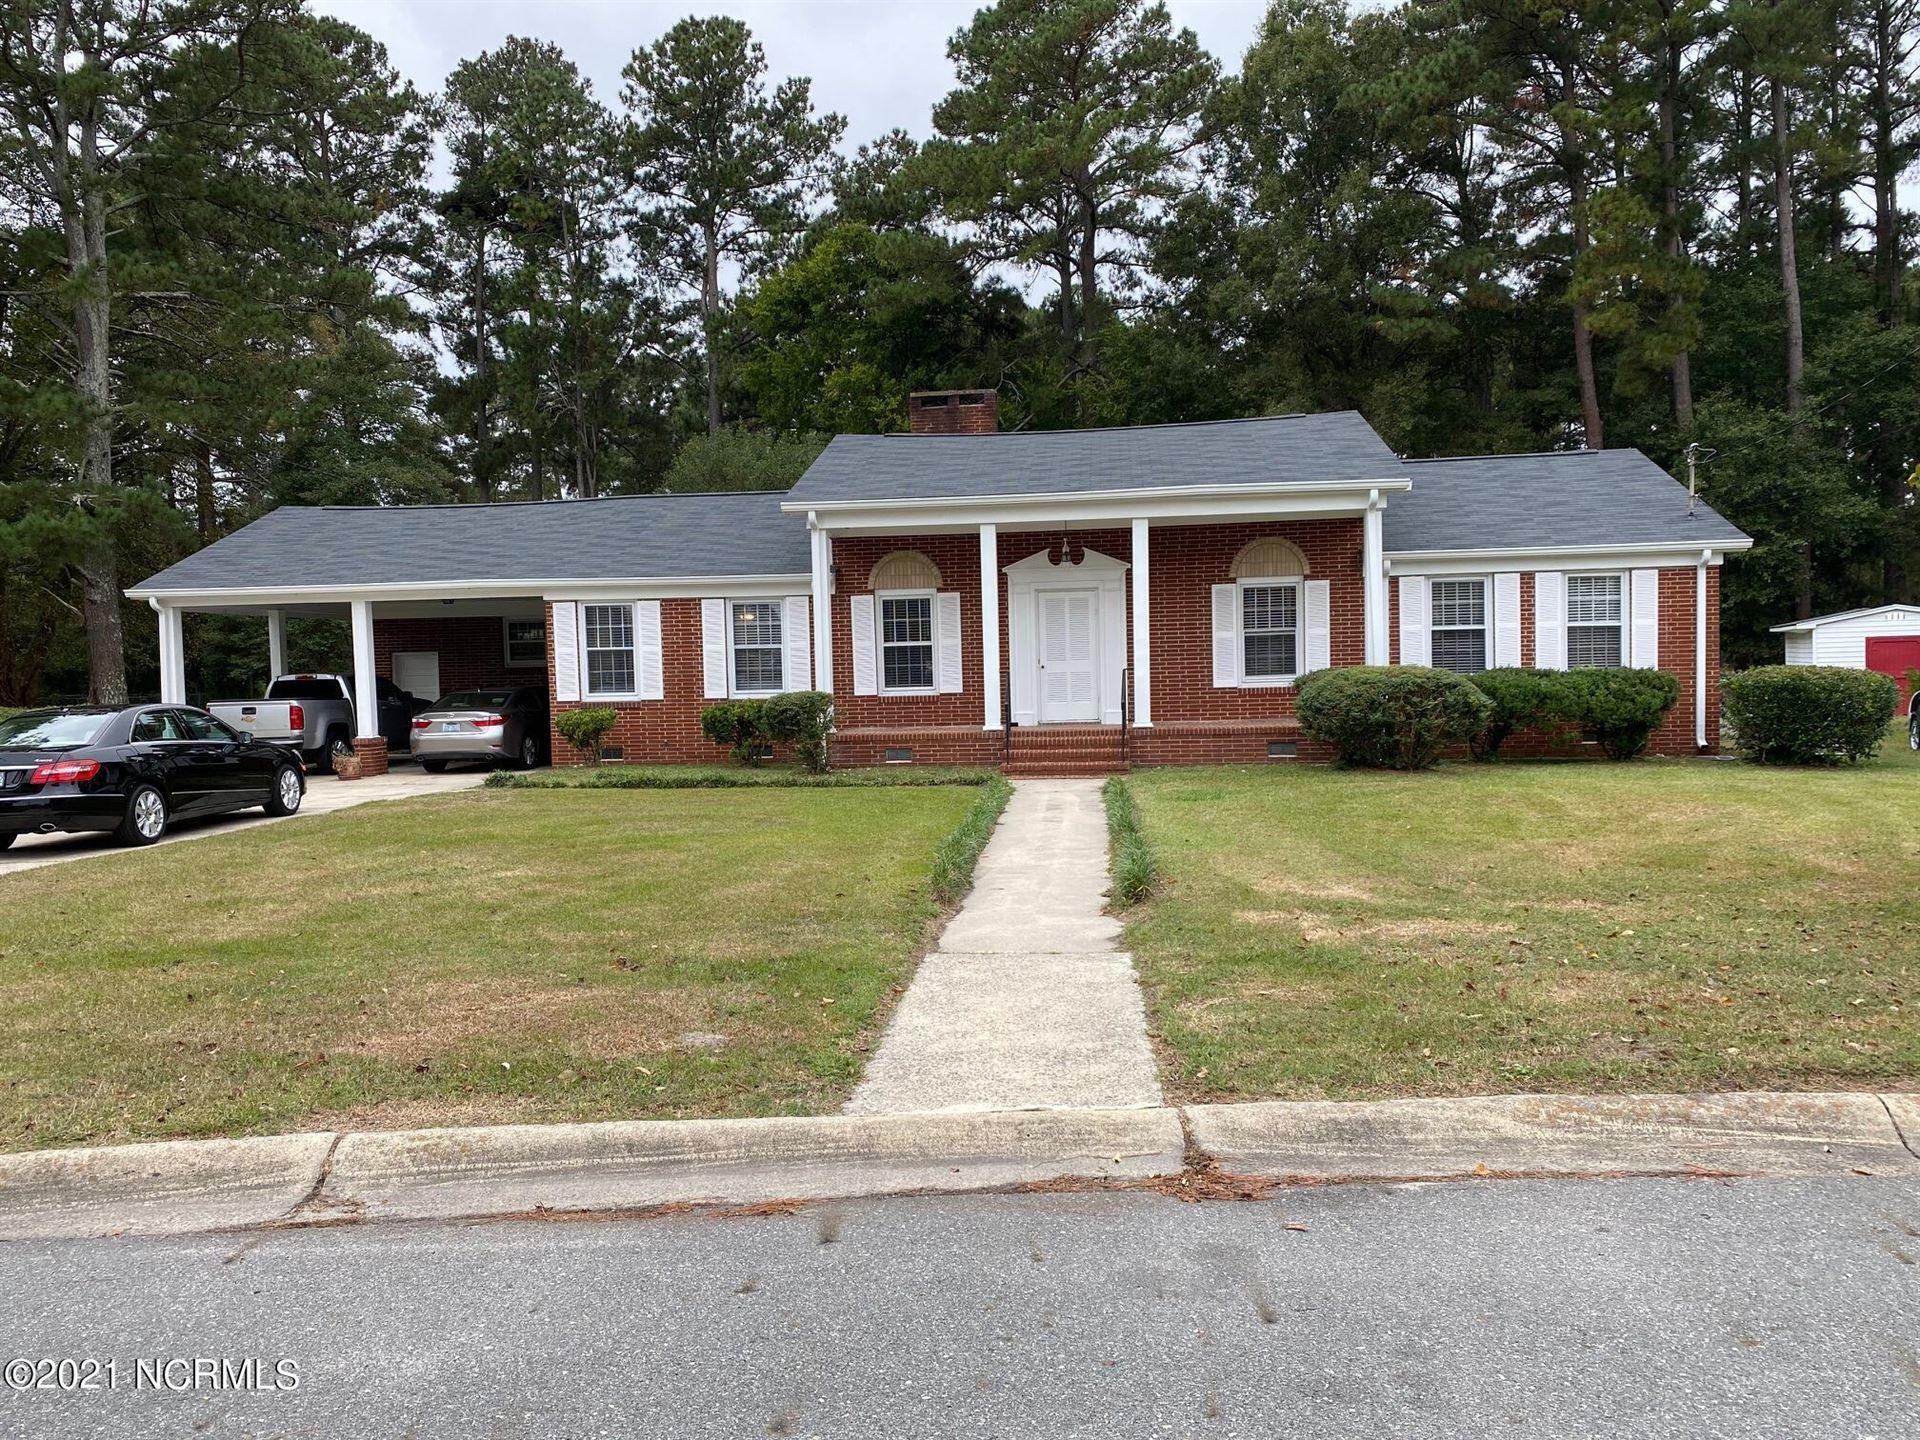 Photo of 1309 Hamilton Drive, Goldsboro, NC 27530 (MLS # 100295157)